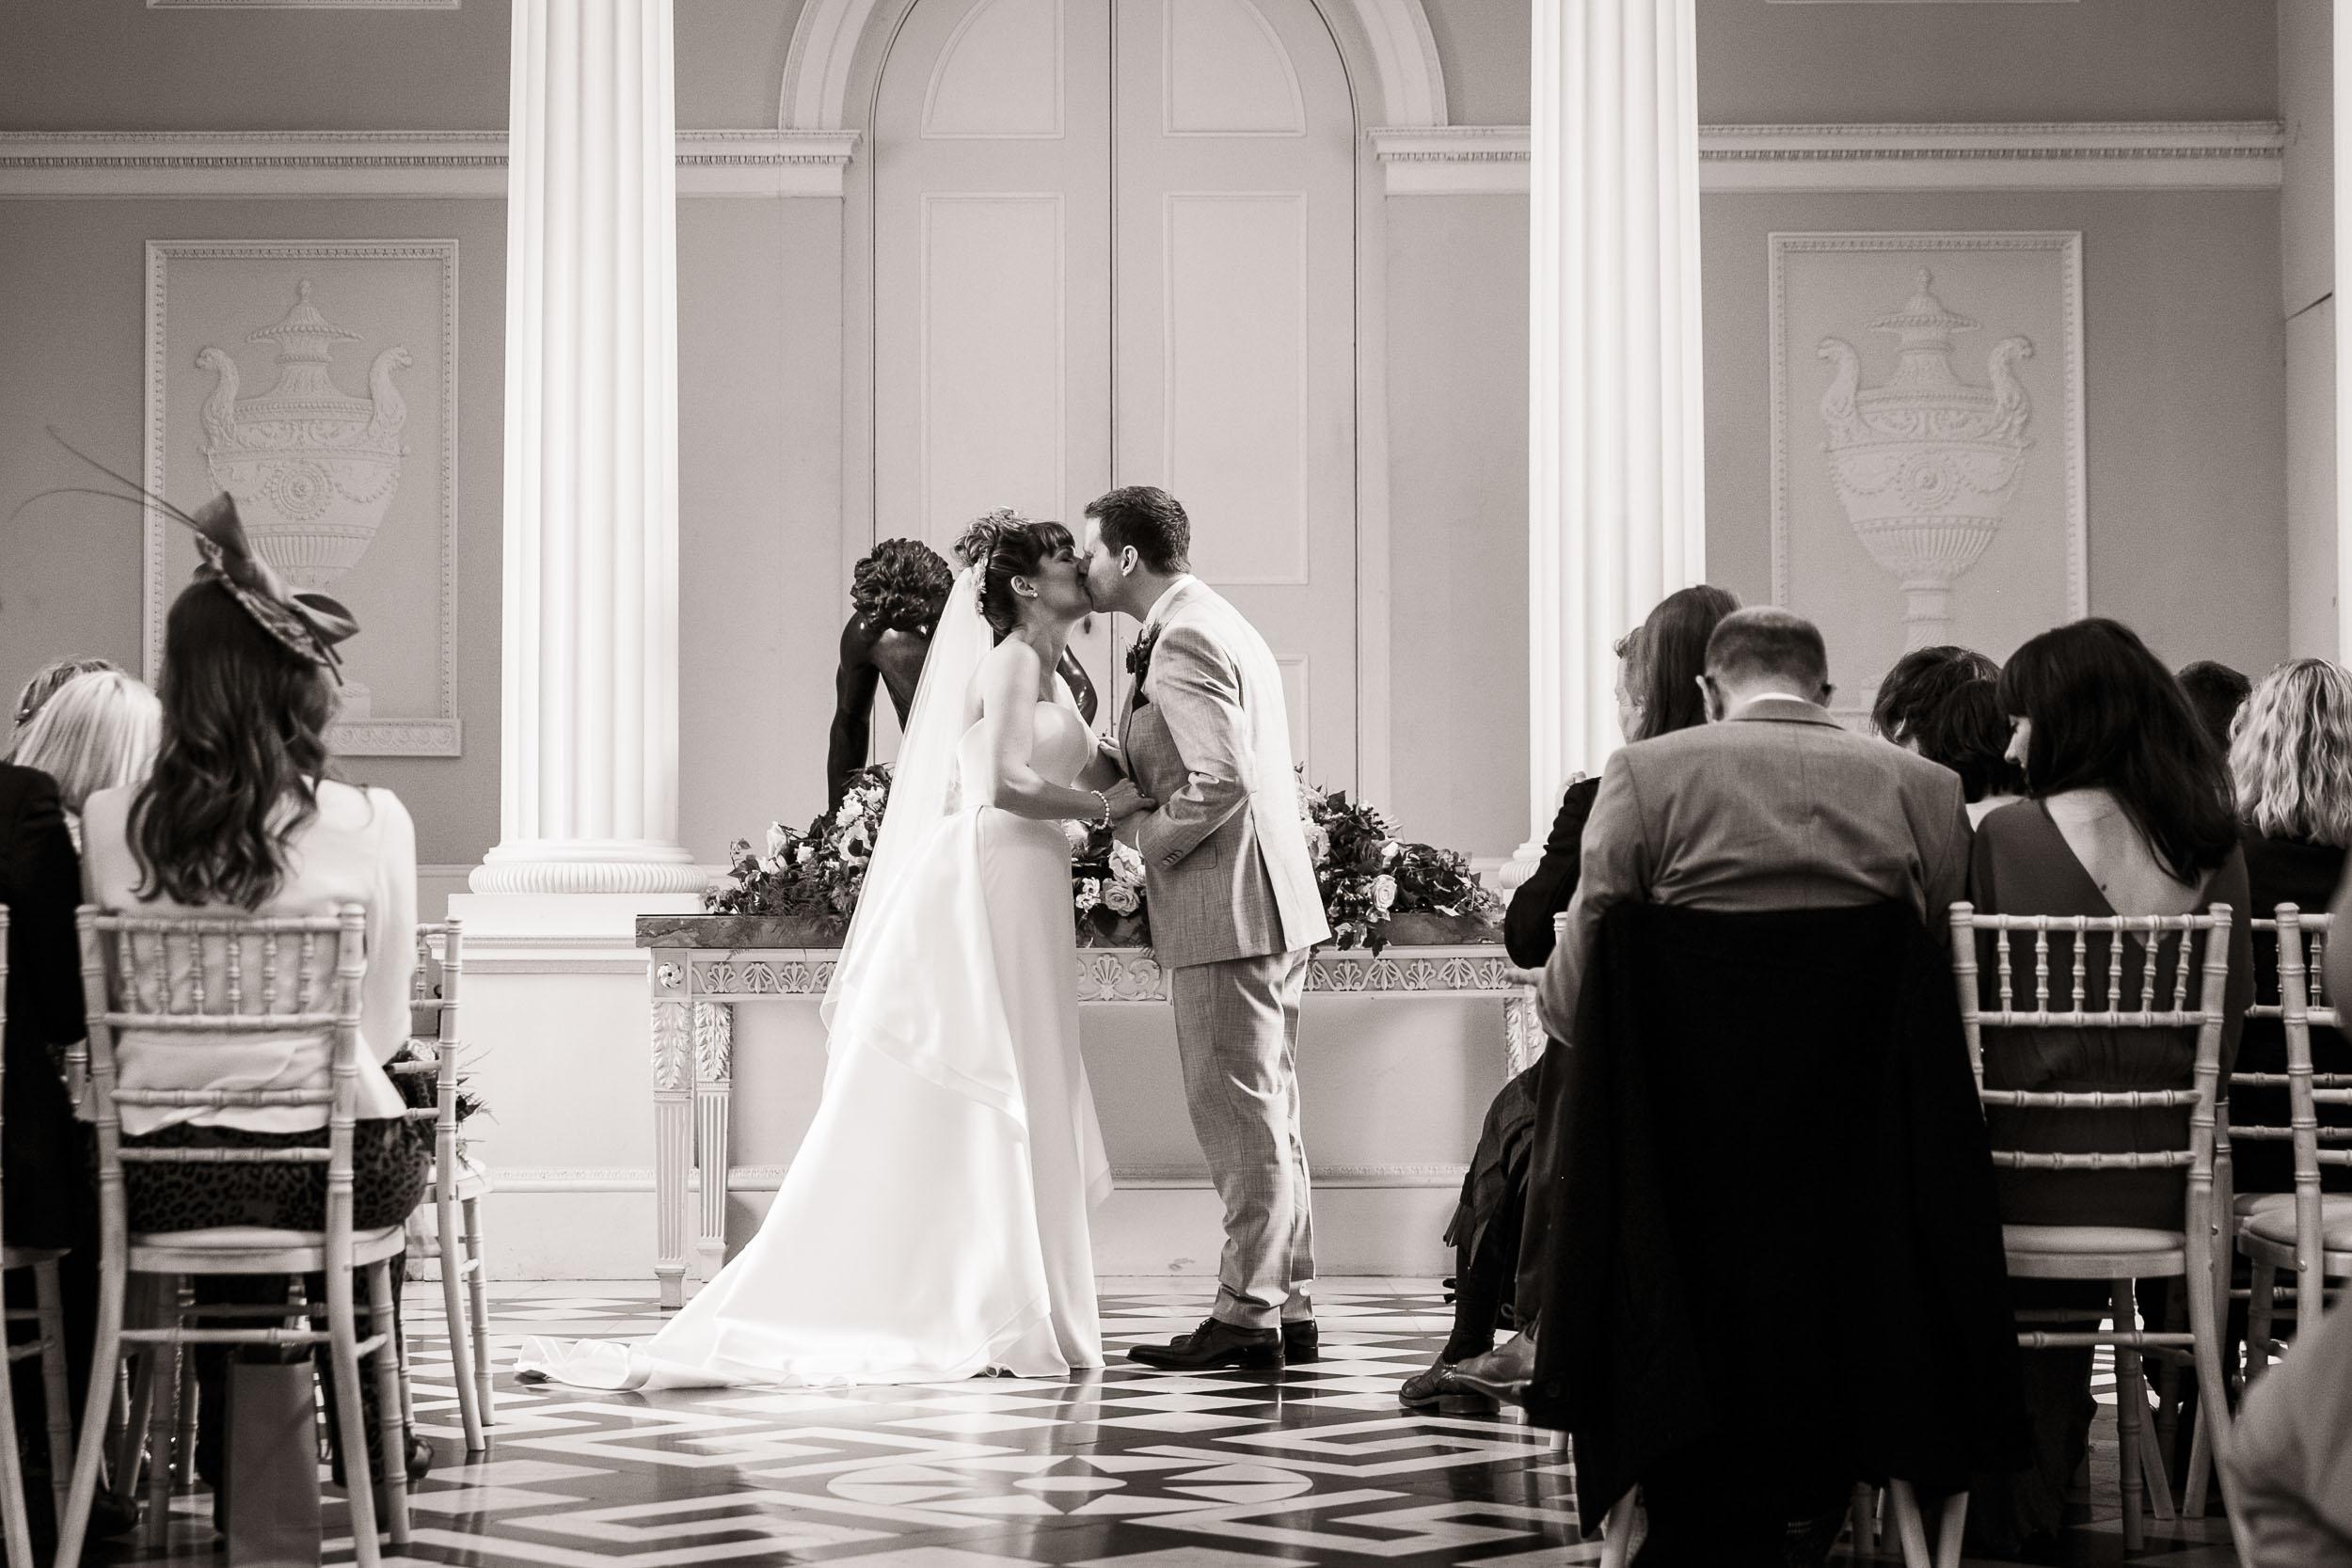 syon-house-wedding-photographer-london 061.jpg